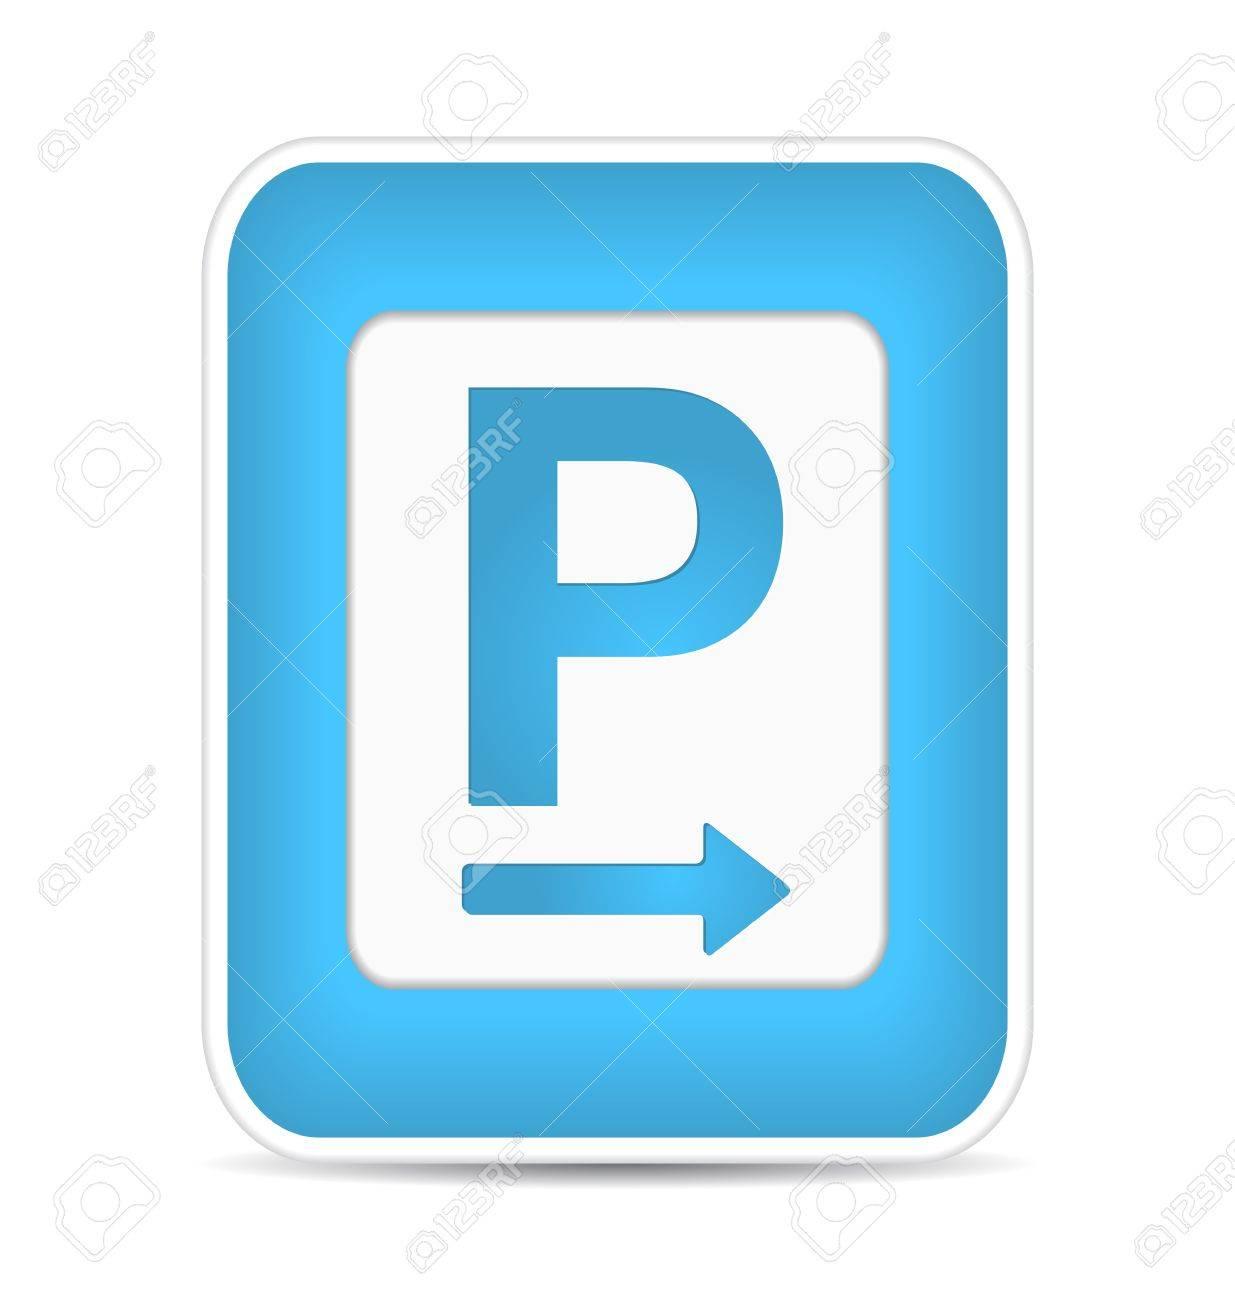 Car parking sign,  illustration Stock Vector - 17885196